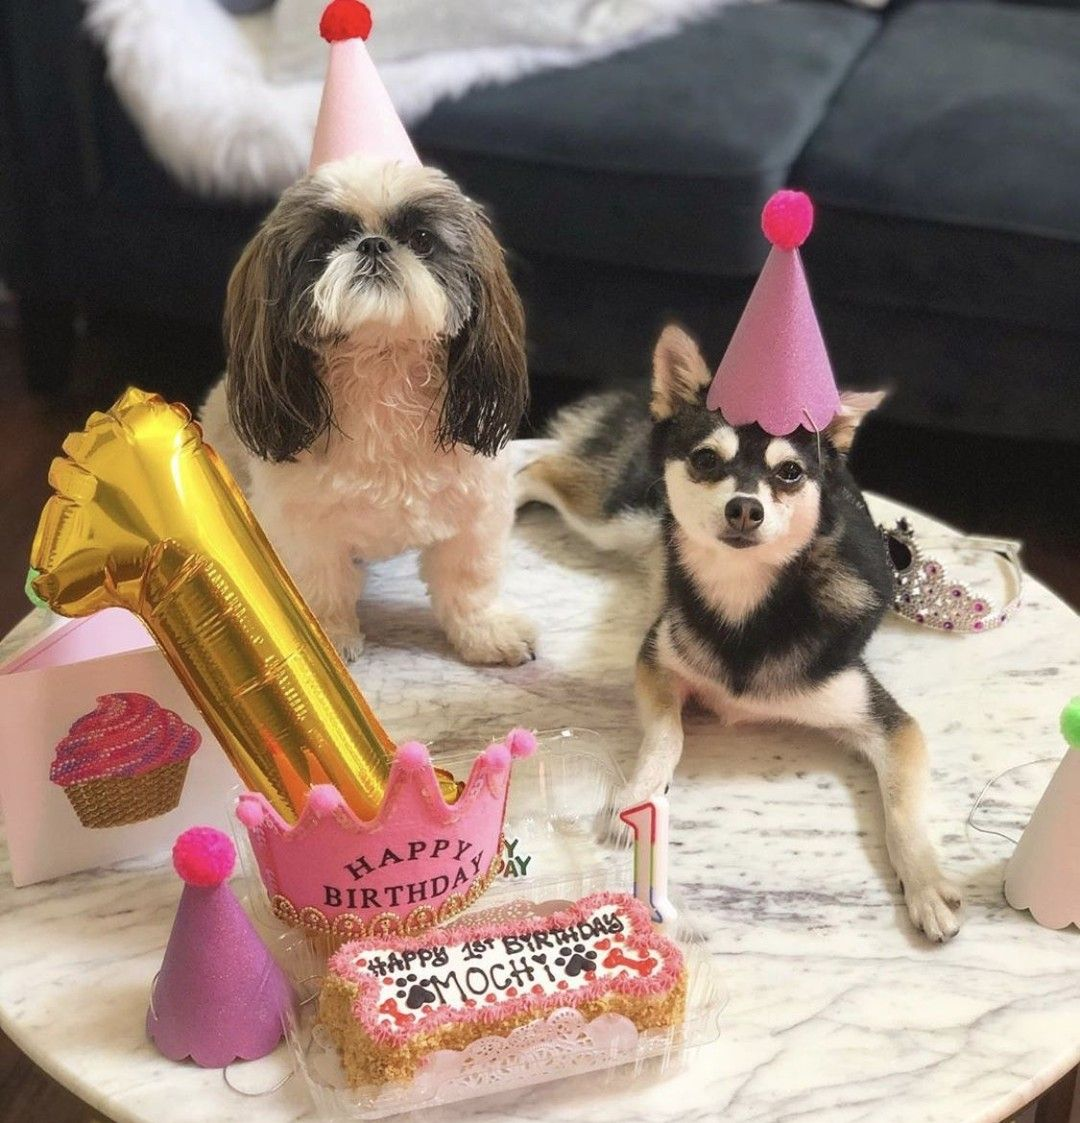 Today my beautiful niece @mochi_kleekai turns 1🎂🎈!We got to celebrate together!🎂💥  📸@beachdoggylilly . . . . . .  #1stbirthday #kleekai #dogbirthday #cutedogs#birthdayparty #doodlesofinstagram #minigoldendoodle #poodlepup #goldenretrieverpup #goldendoodle #doodles #puppiesofinstagram #goldendoodlelove #puppies #newpuppy #newpuppysmell #puppylove🐶 #dogsofinstagram #bestdogever #goldendoodlelife #goldendoodlesofinsta #doodlesofinsta #familydog #goldendoodlepuppy #doodlelove #doodle